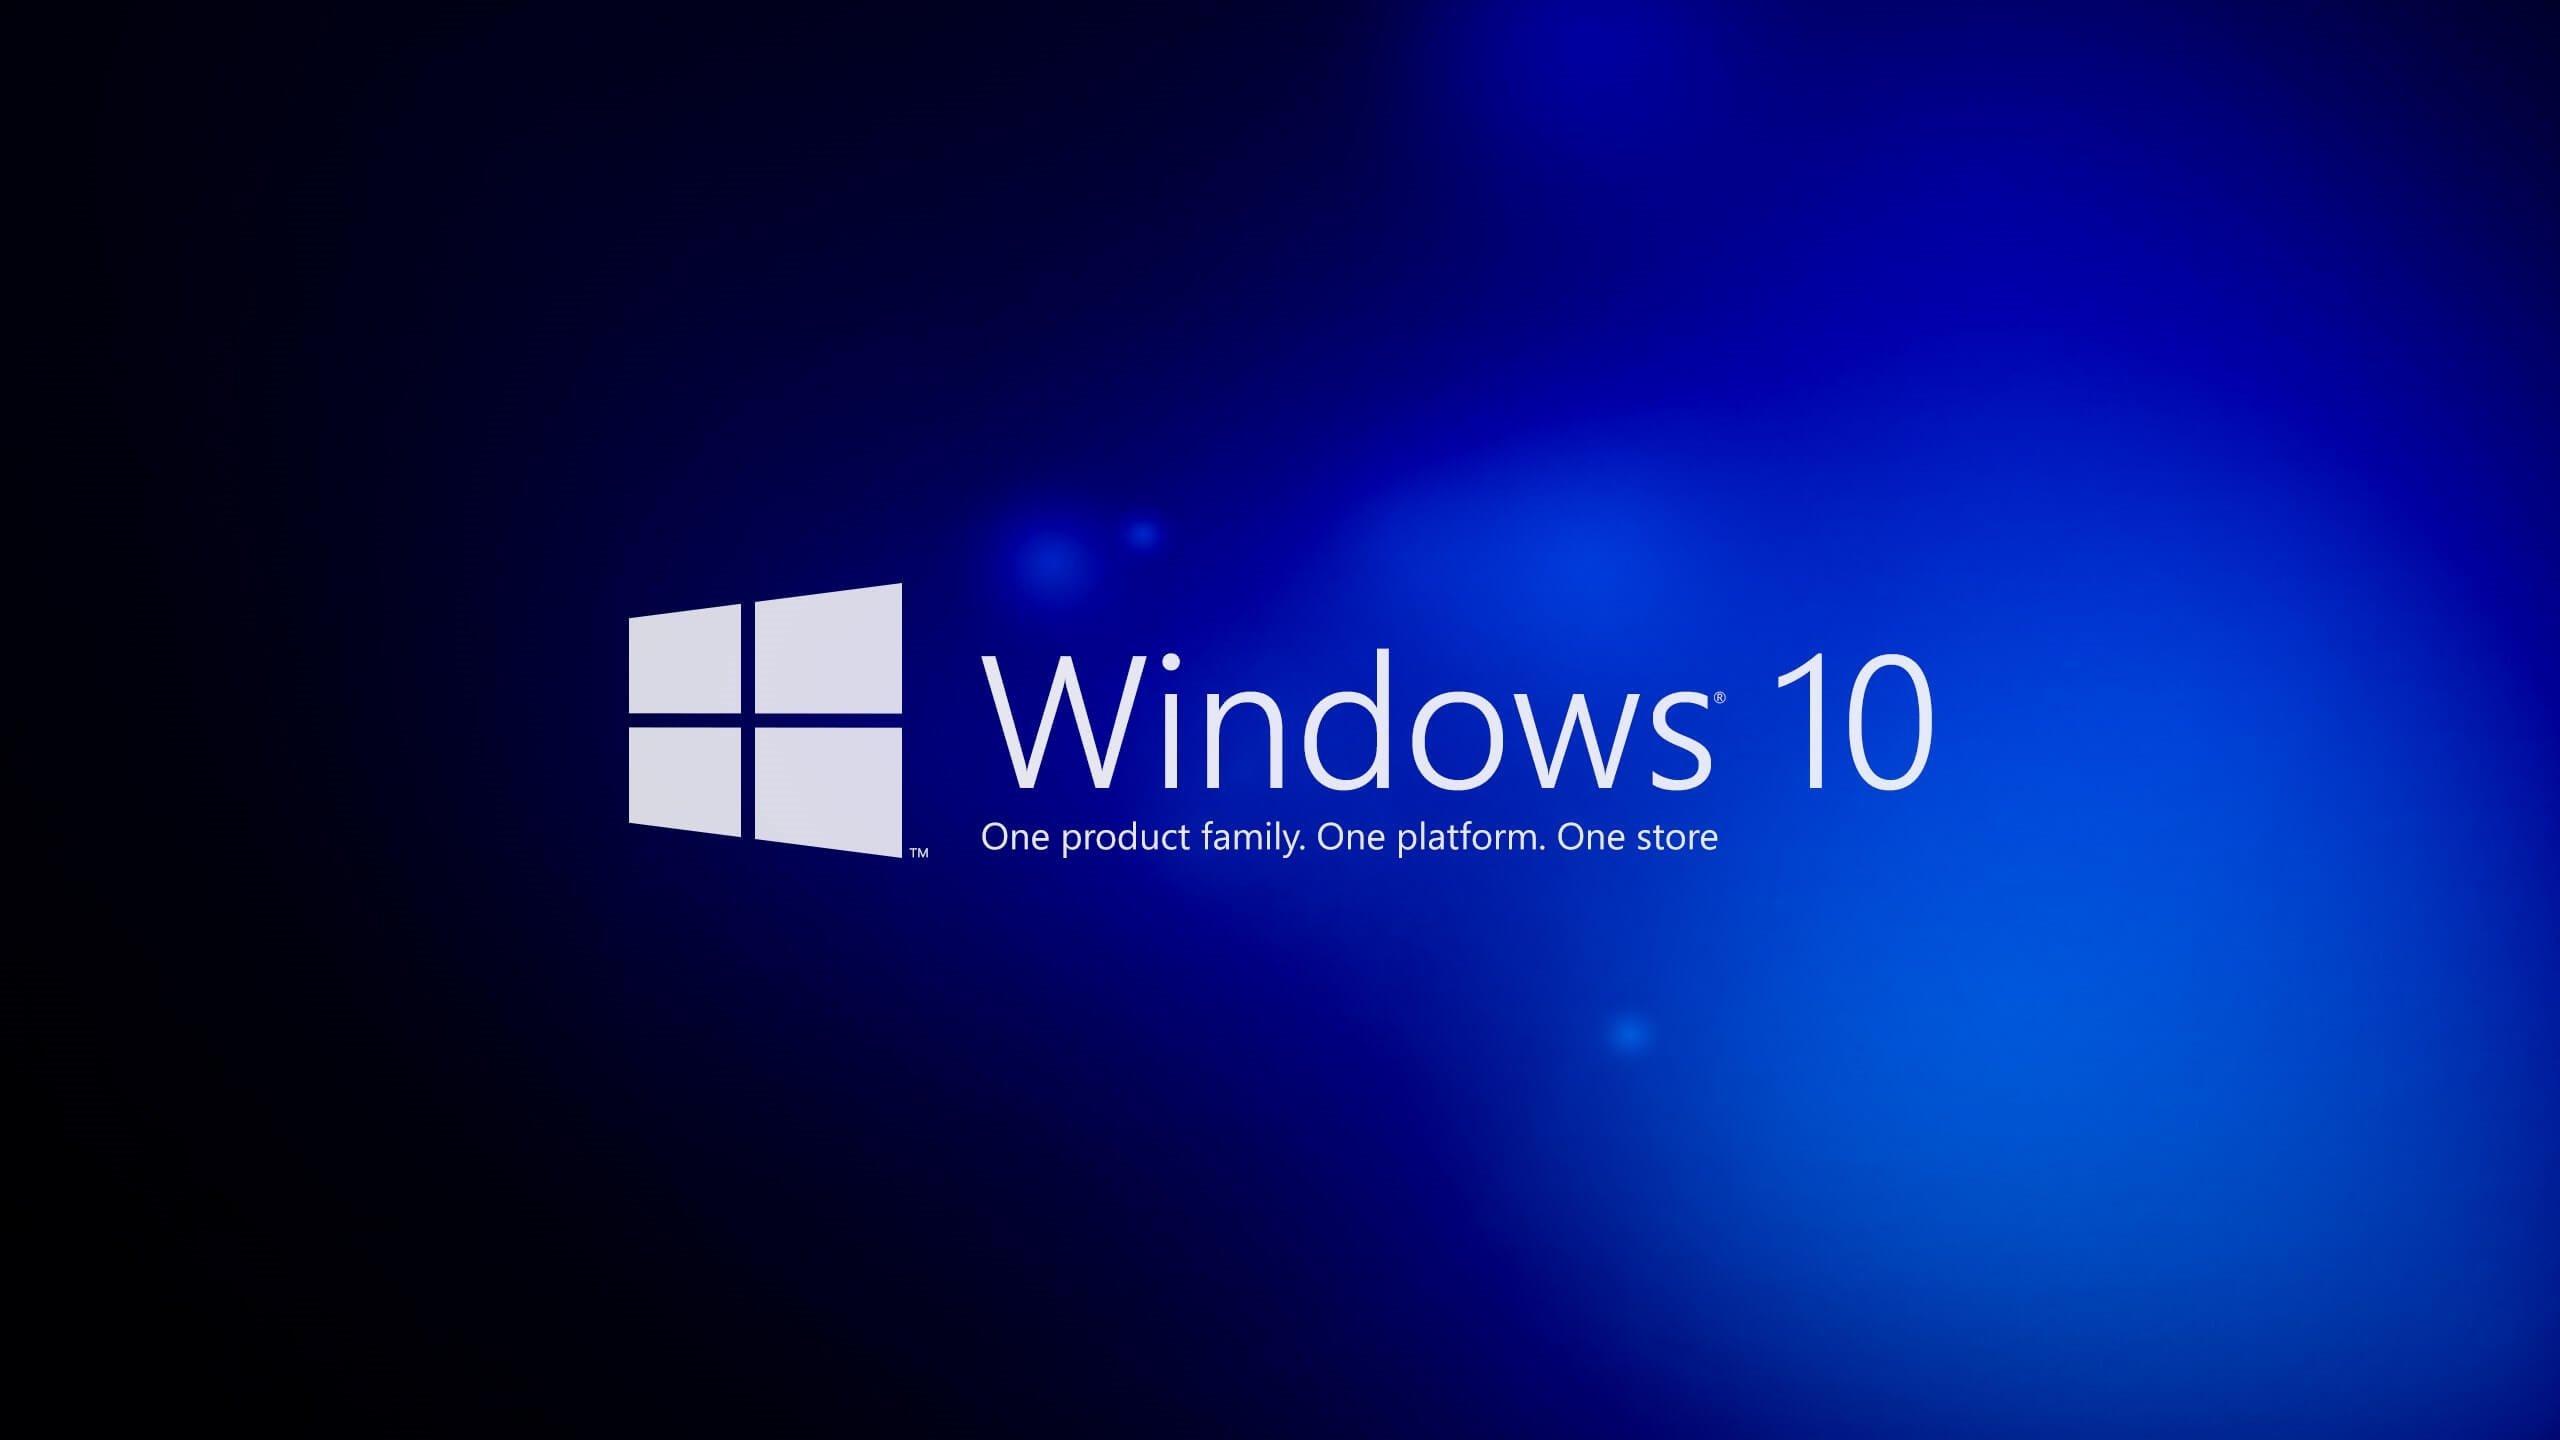 Windows 10 logo azul